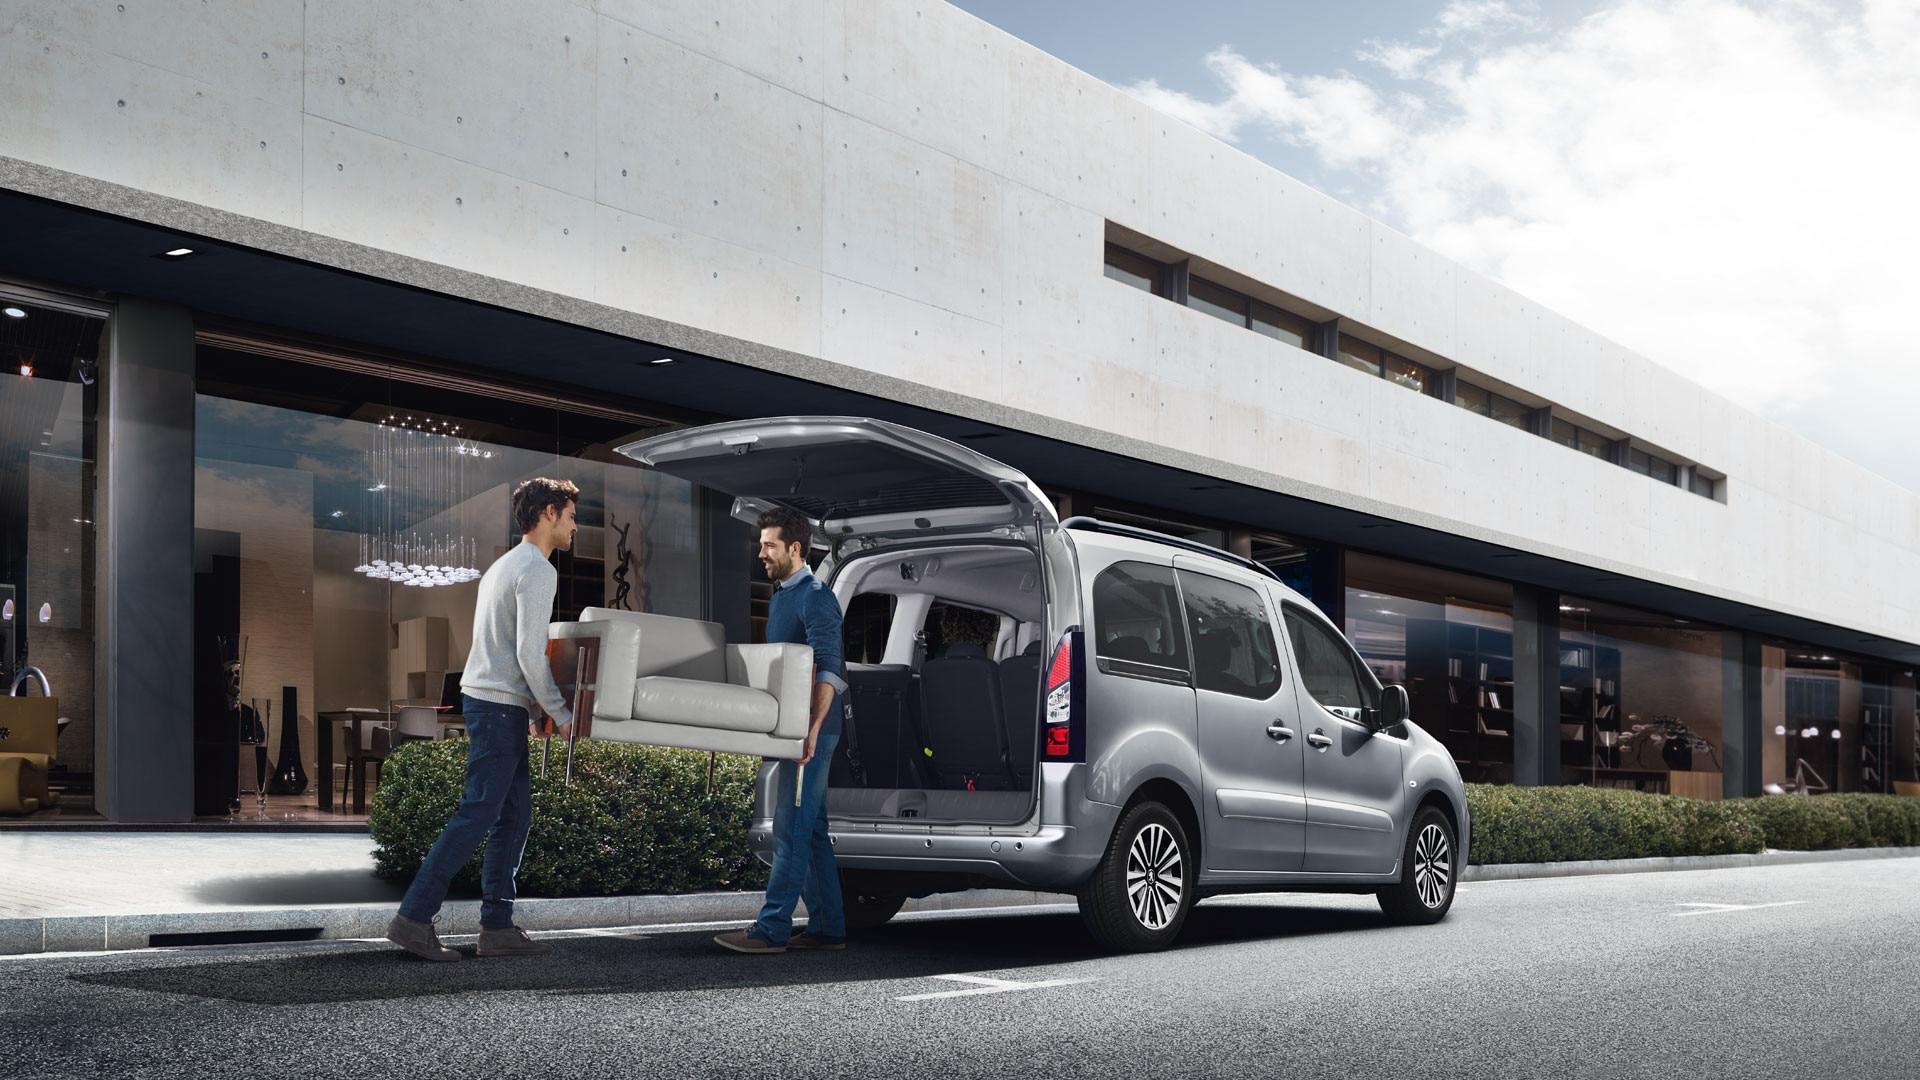 Peugeot Partner Tepee Uk Expert Van Fuse Box Location Optional At Additional Cost